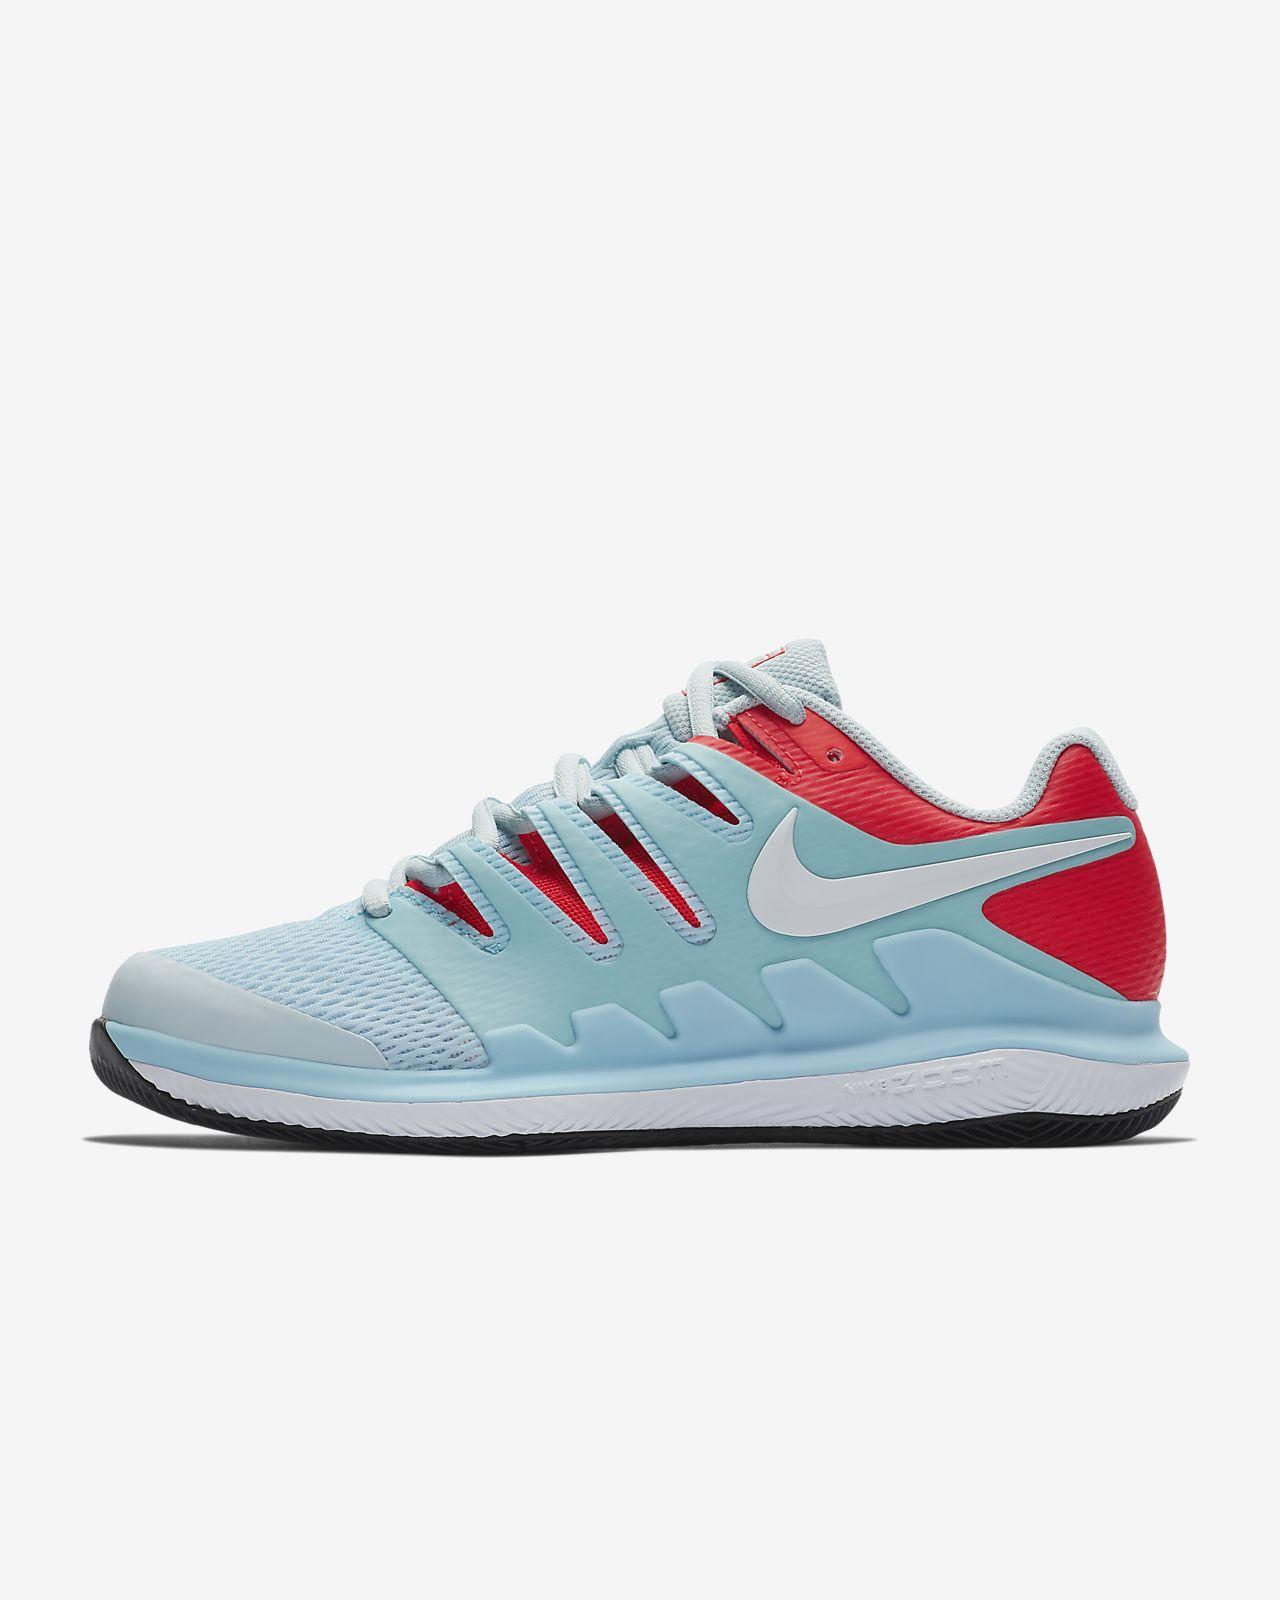 the latest a1a50 77a86 ... Damskie buty do tenisa na twarde korty NikeCourt Air Zoom Vapor X